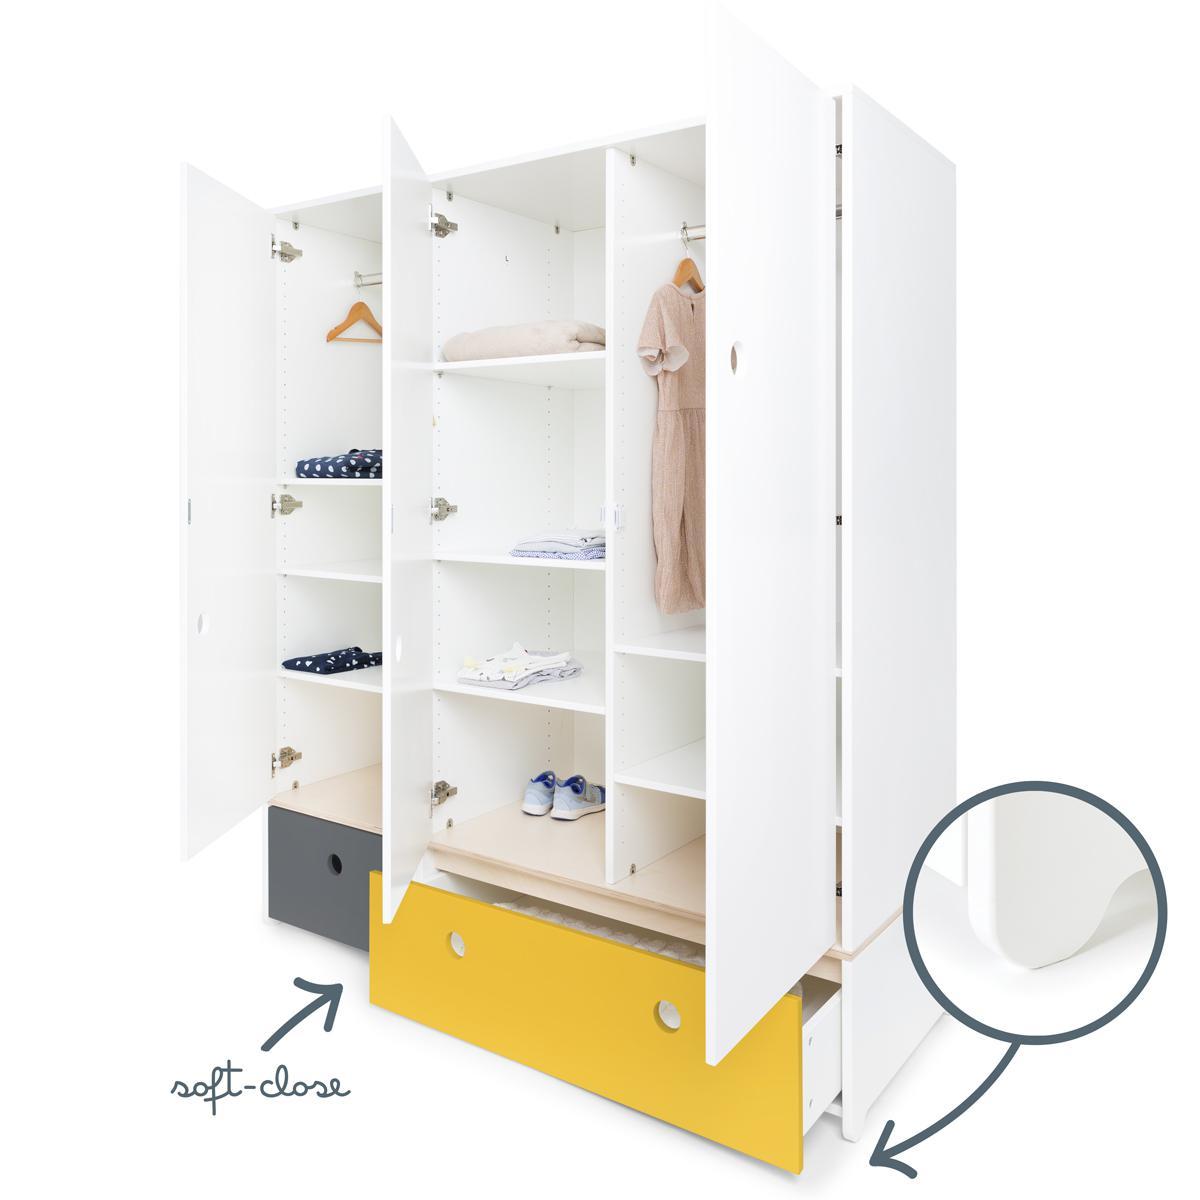 Armoire 3 portes COLORFLEX façades tiroirs space grey-nectar yellow